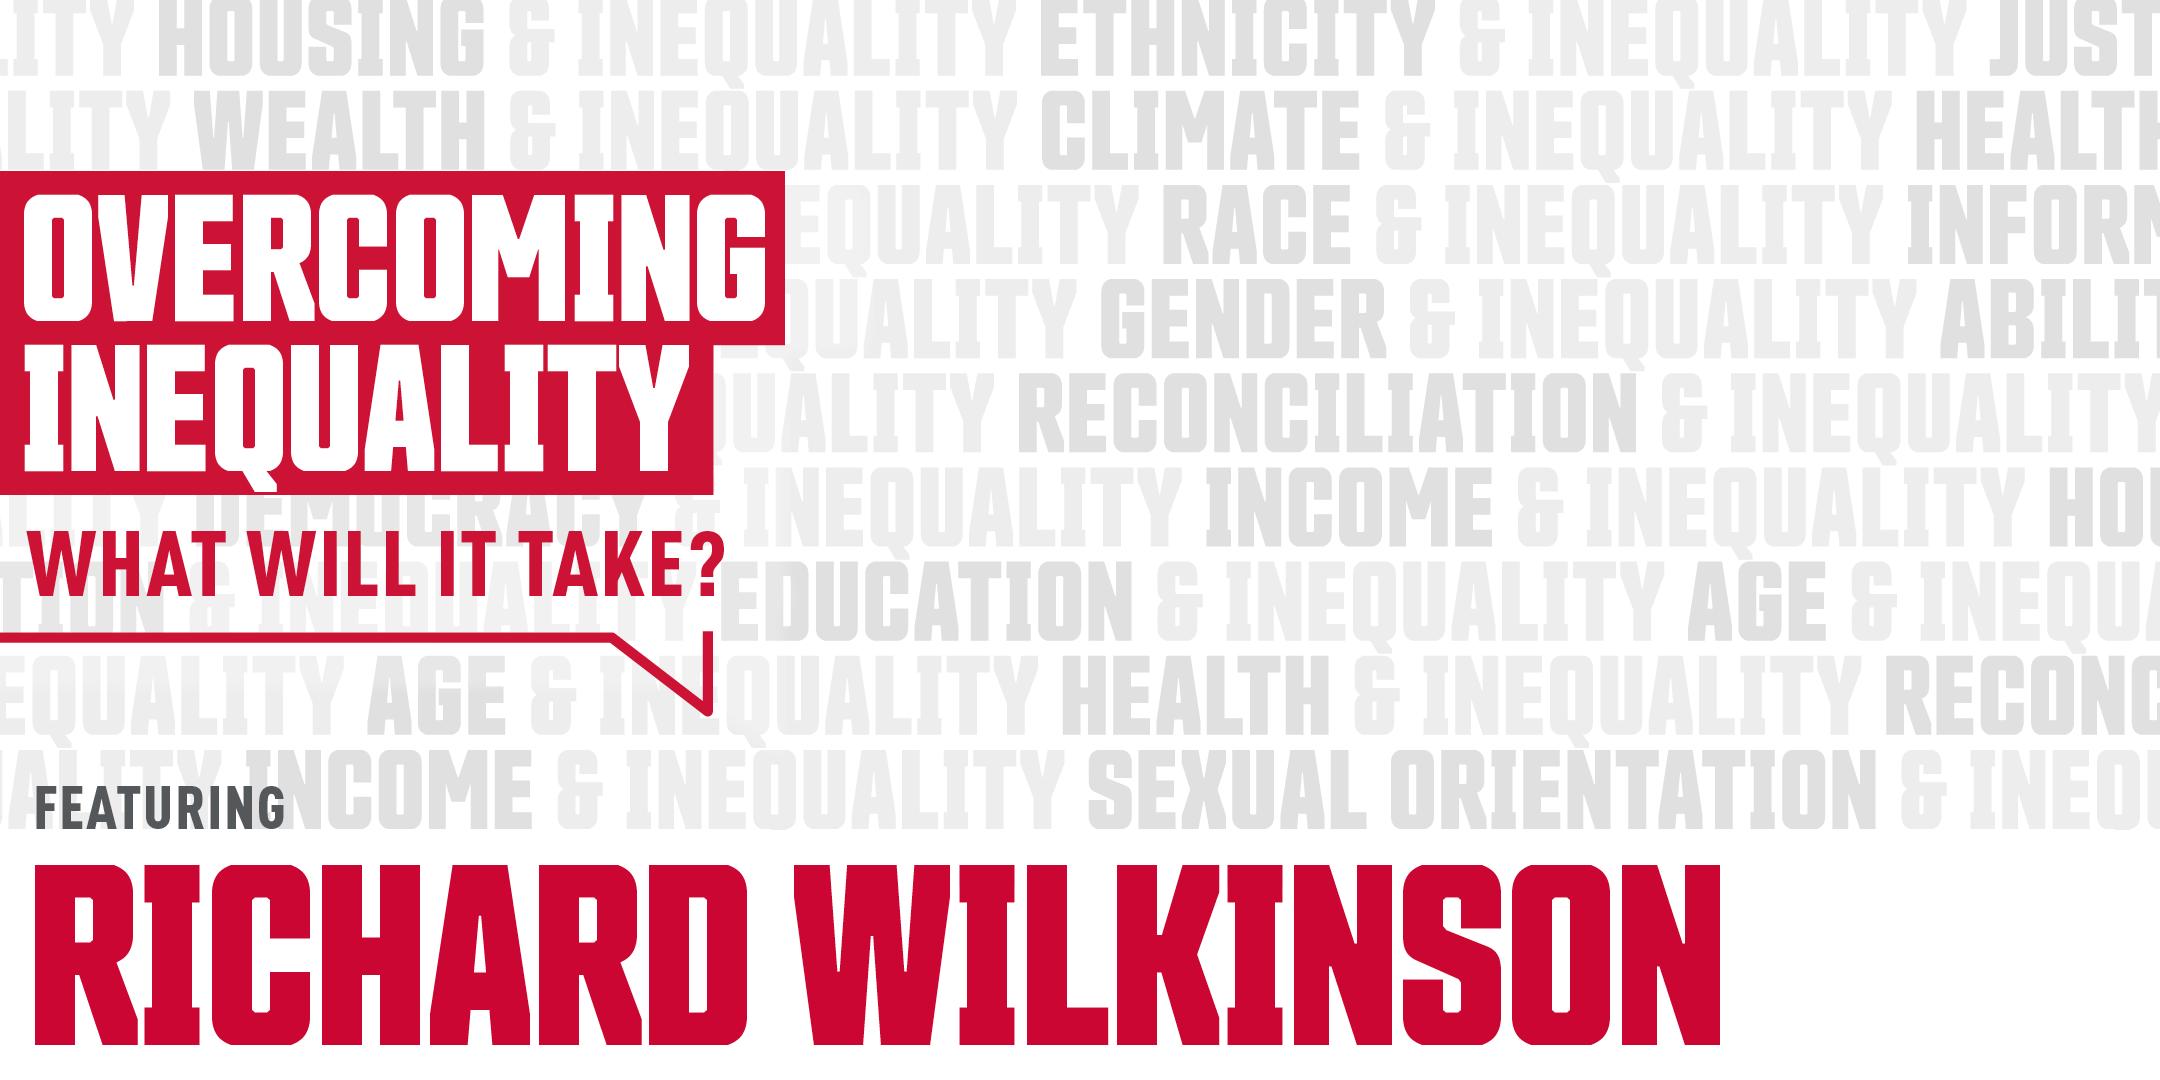 Overcoming Inequality featuring Richard Wilkinson